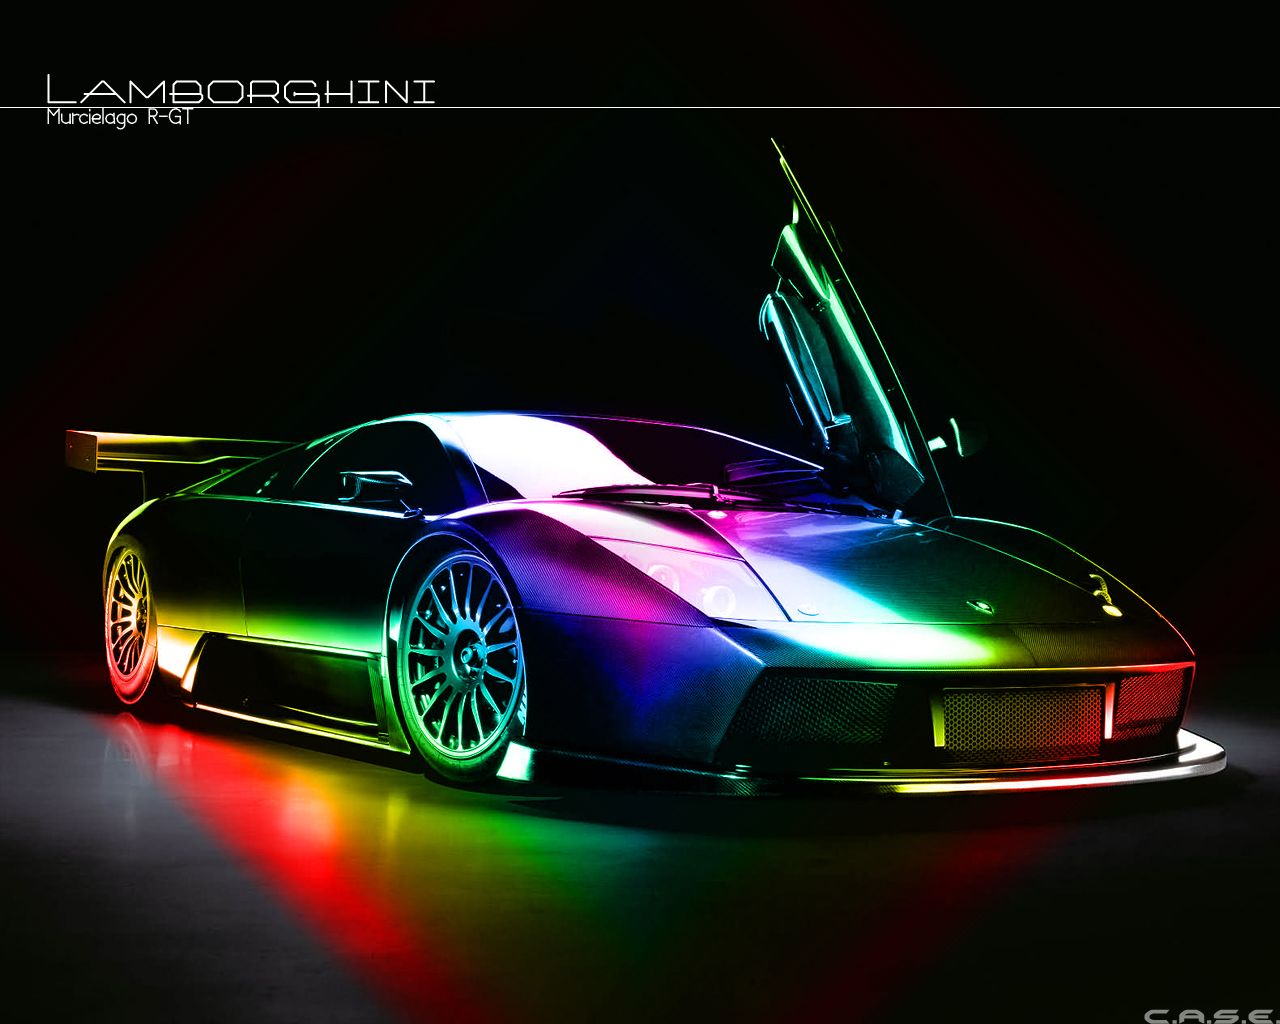 Rainbow Lamborghini Wallpapers Wallpapersafari